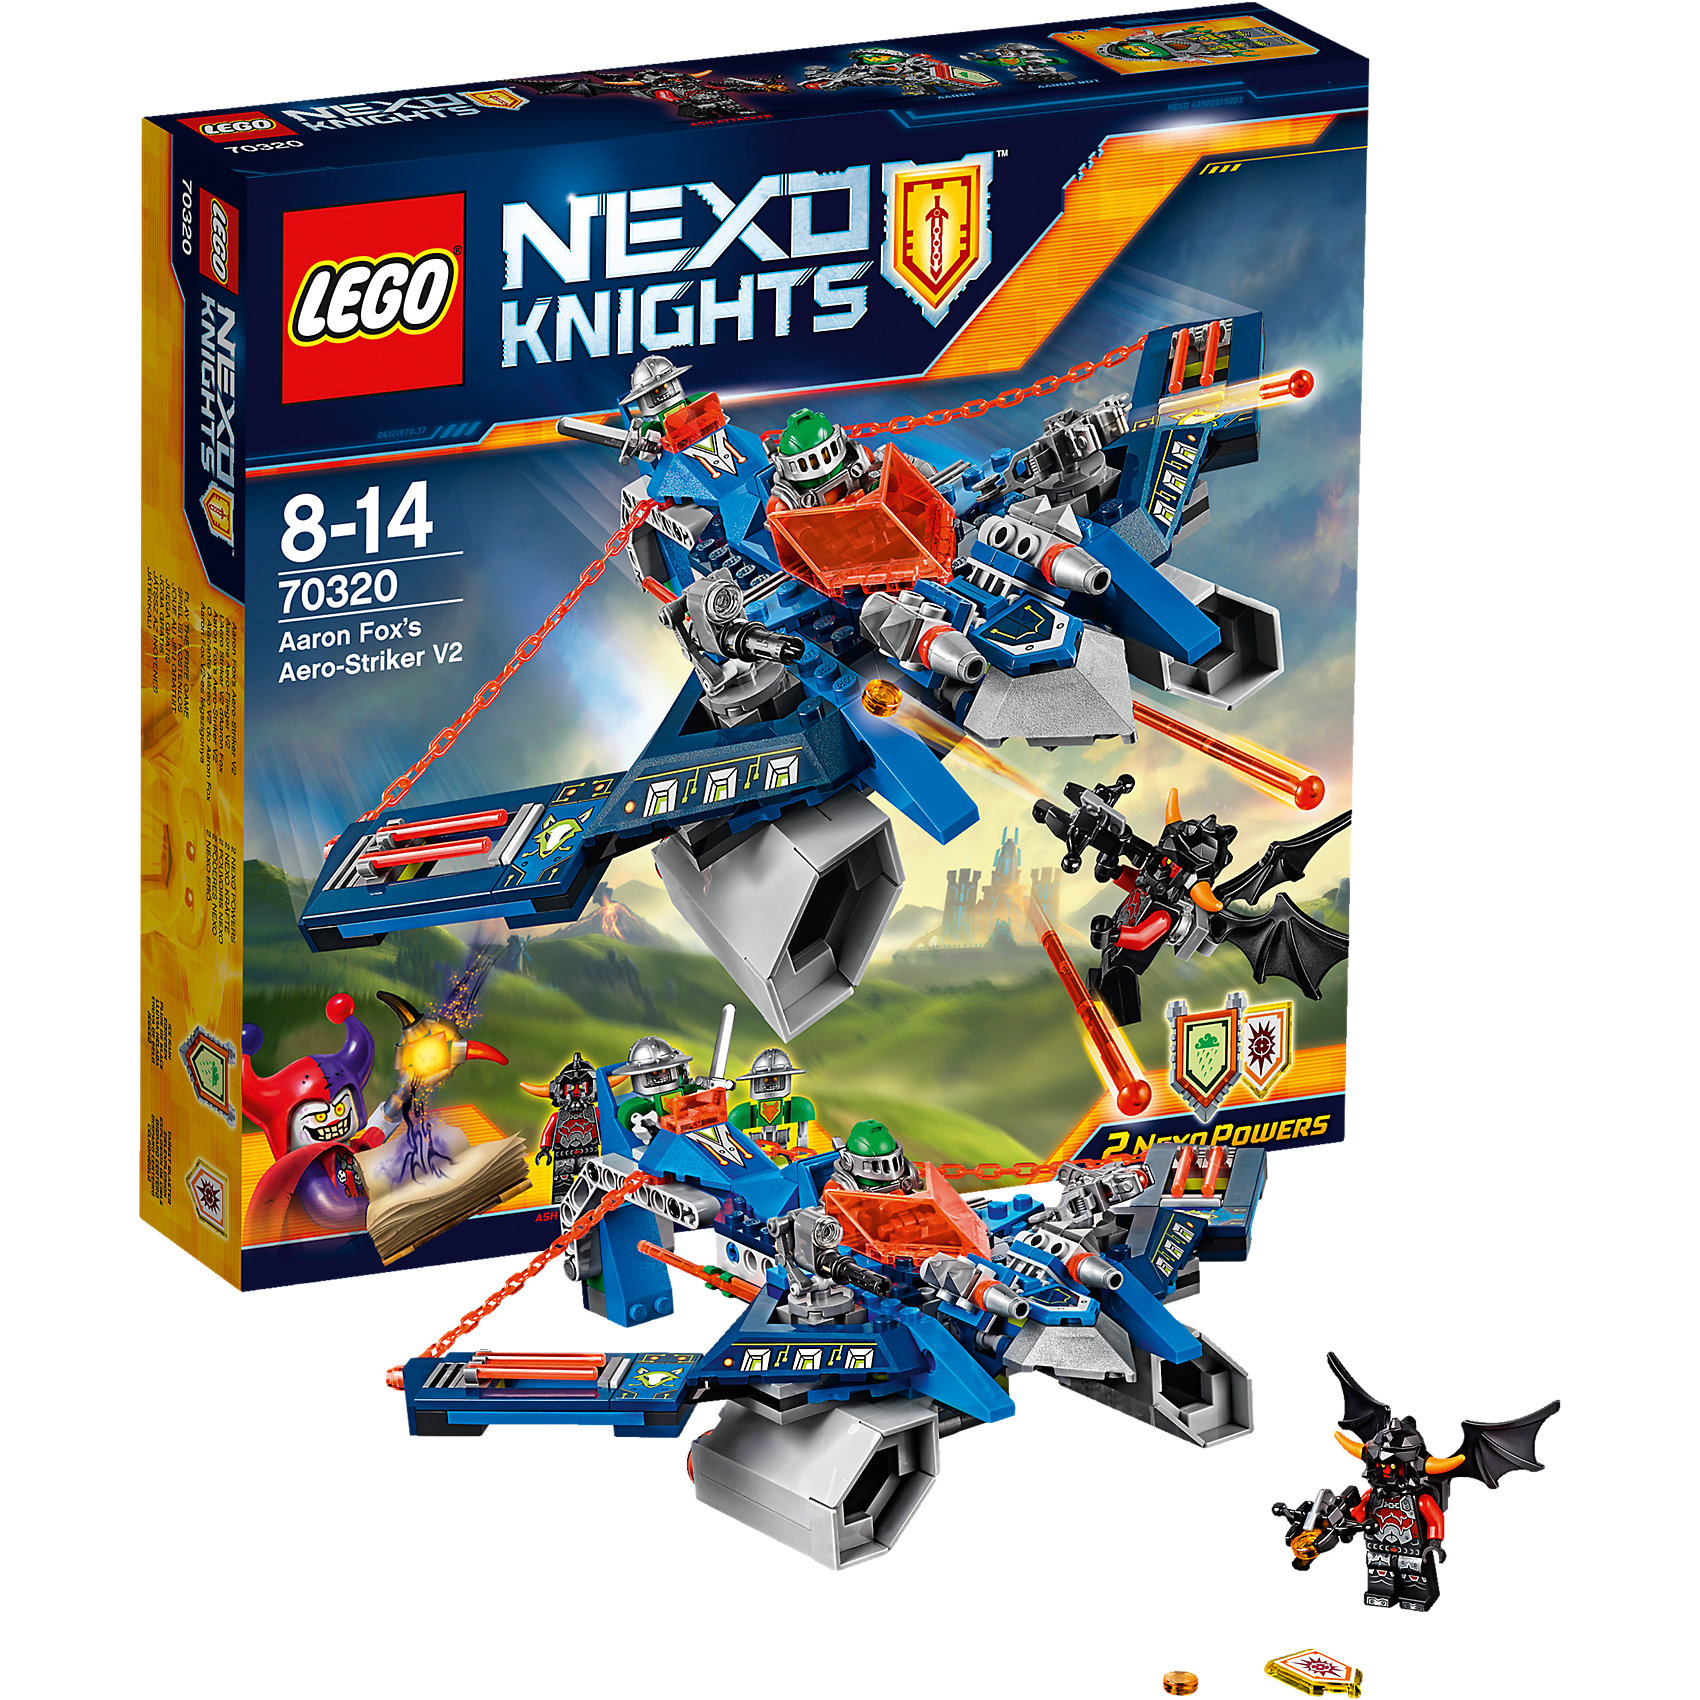 LEGO LEGO NEXO KNIGHTS 70320: Аэро-арбалет Аарона купить арбалет оптом в москве